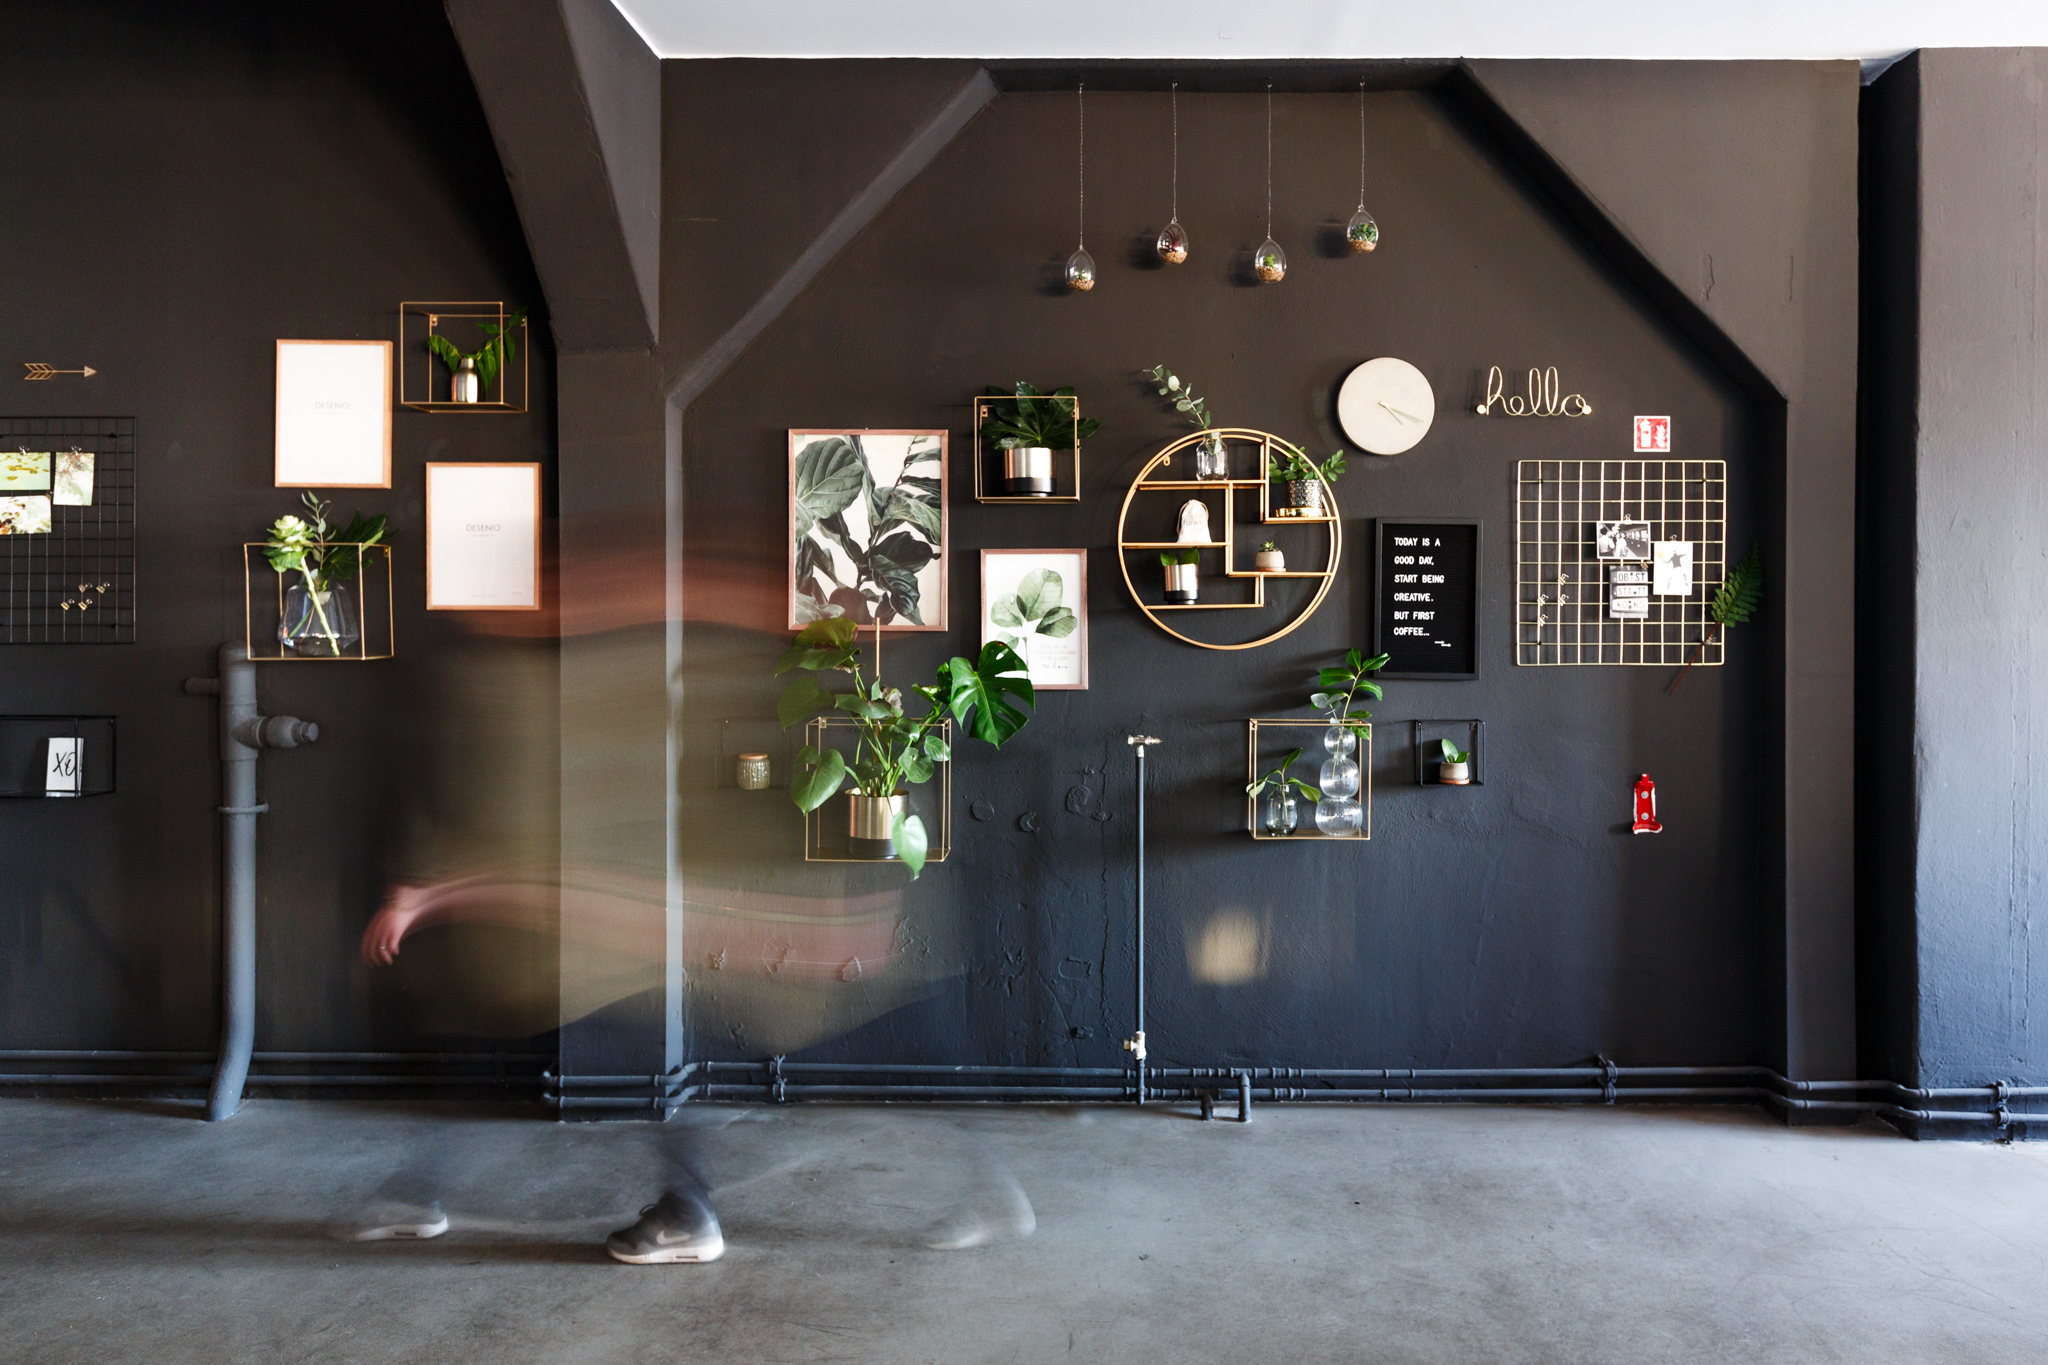 PeakAce-Büro-Wandgestaltung-Dittmarandfriends.jpg